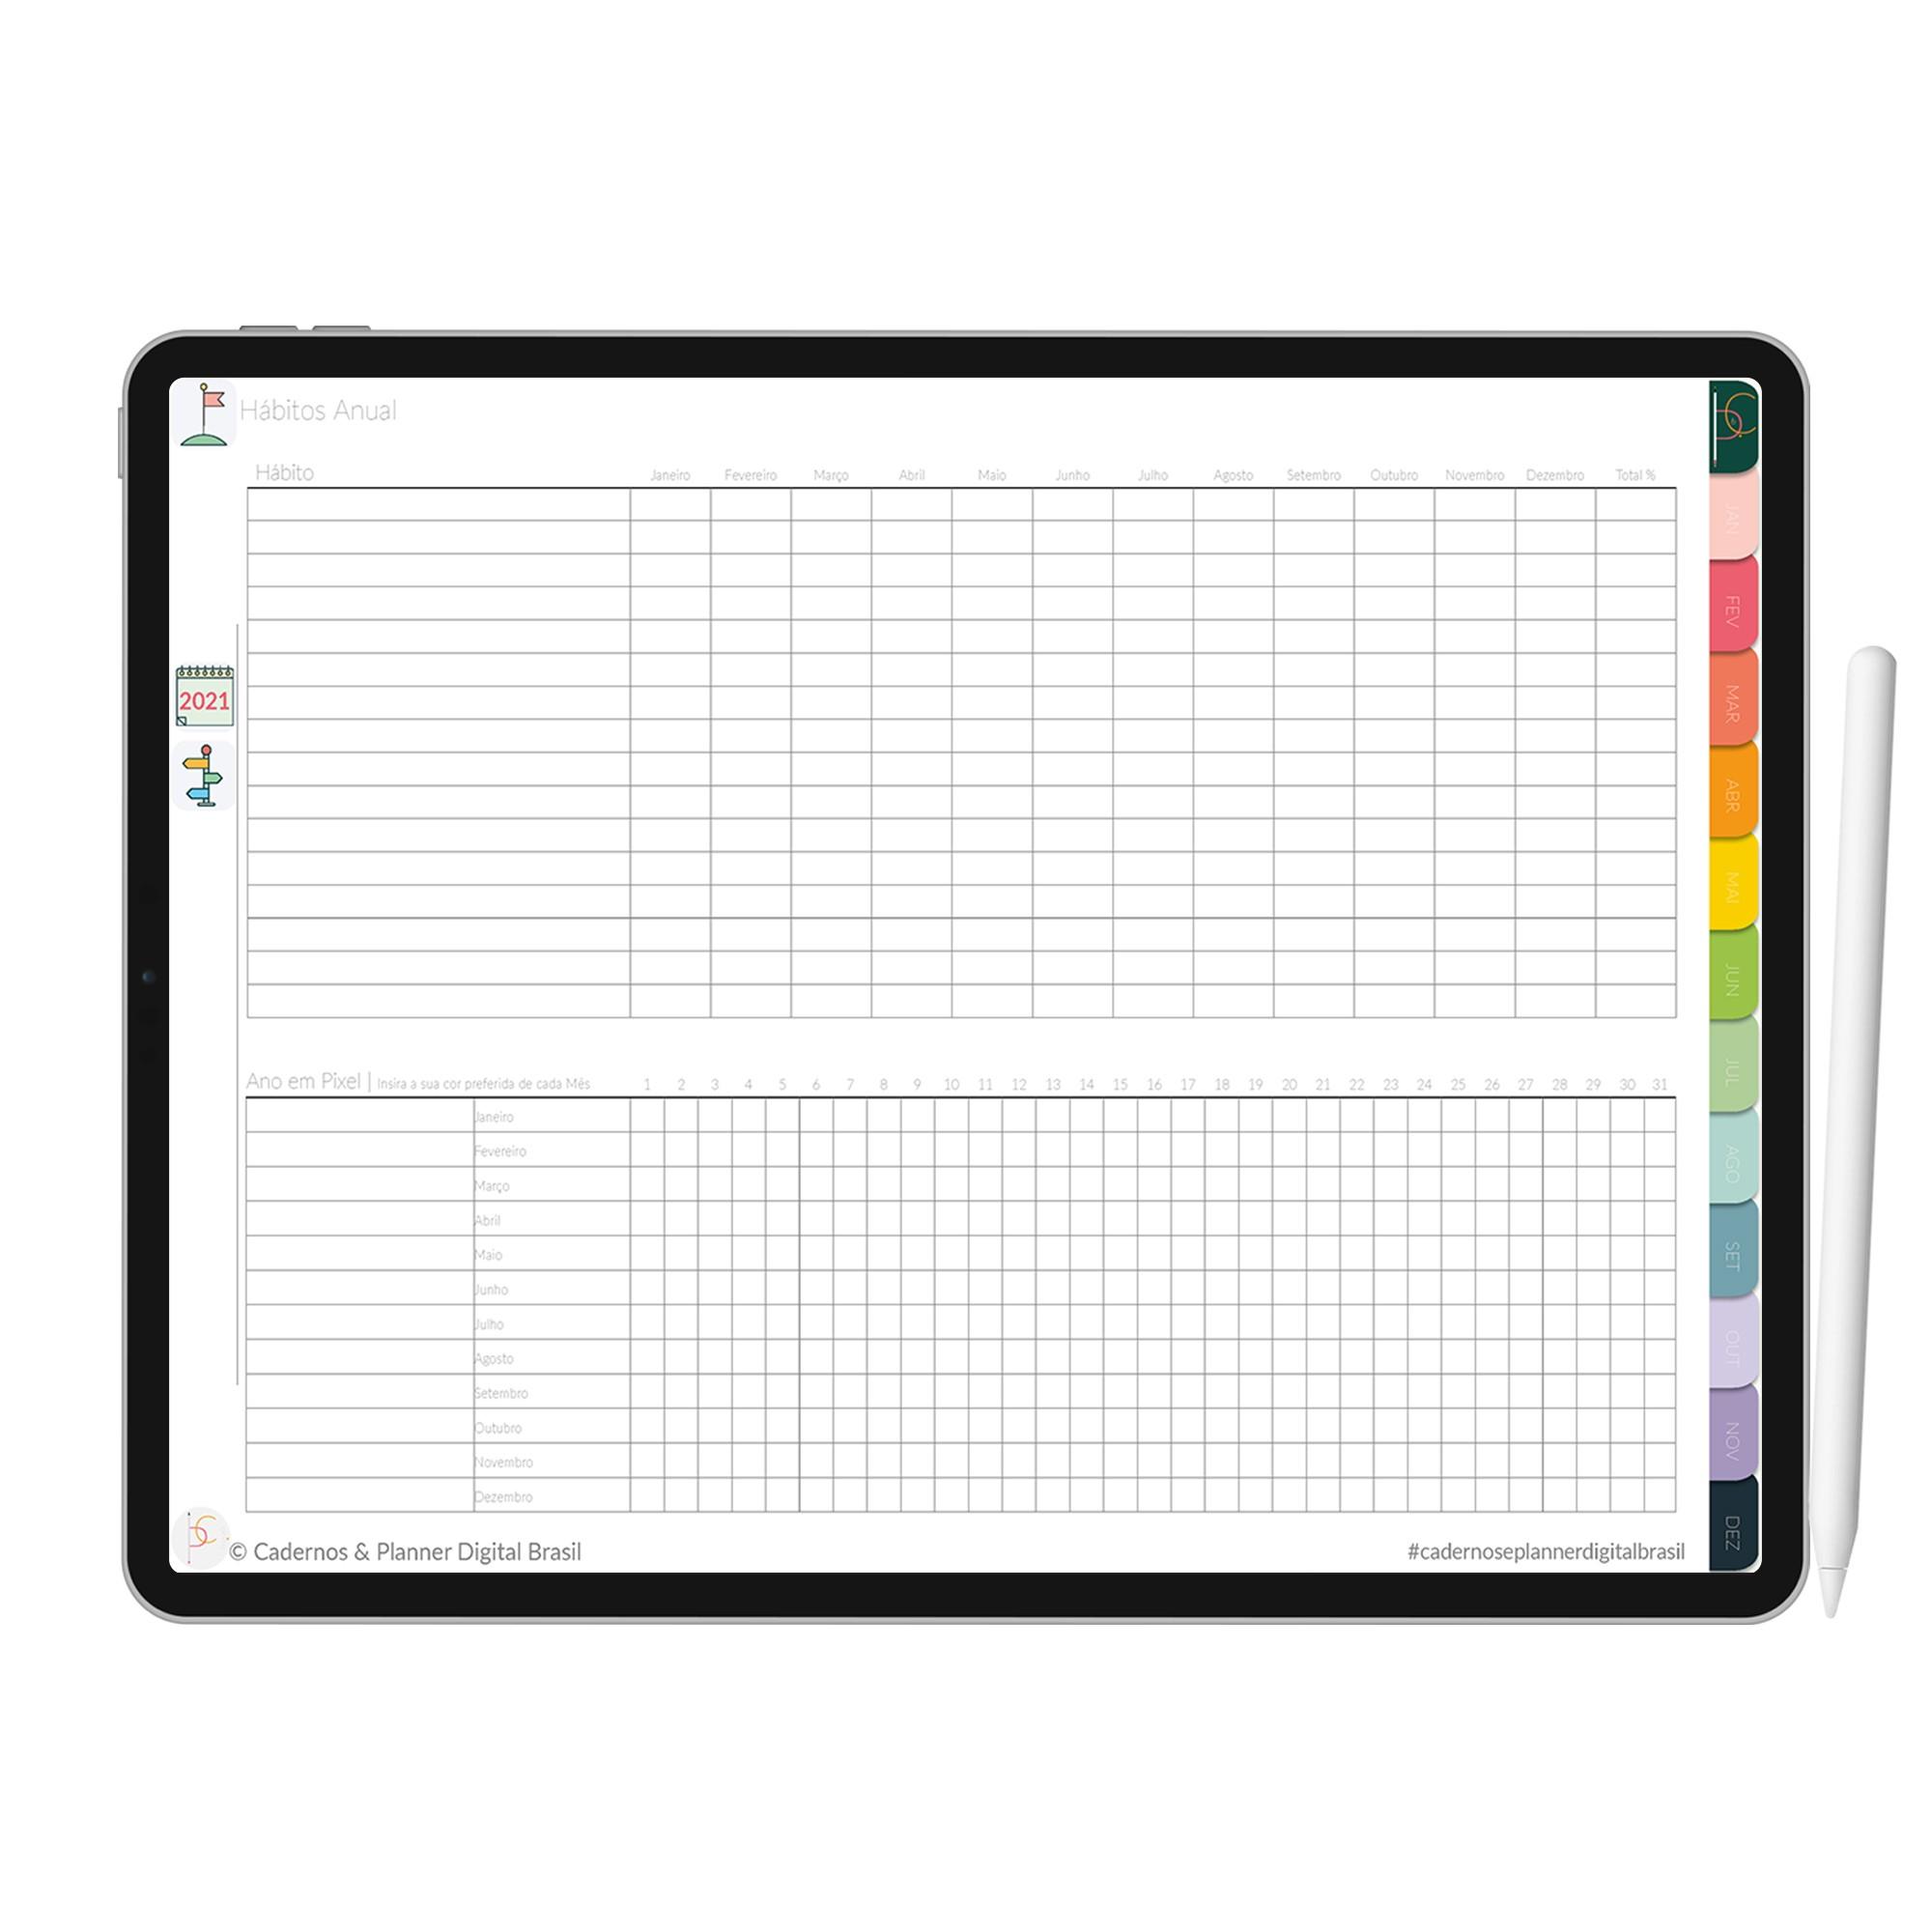 Planner Digital | Anual, Mensal, Semanal, Diário |  Objetivos e Metas | iPad Tablet | Download Instantâneo